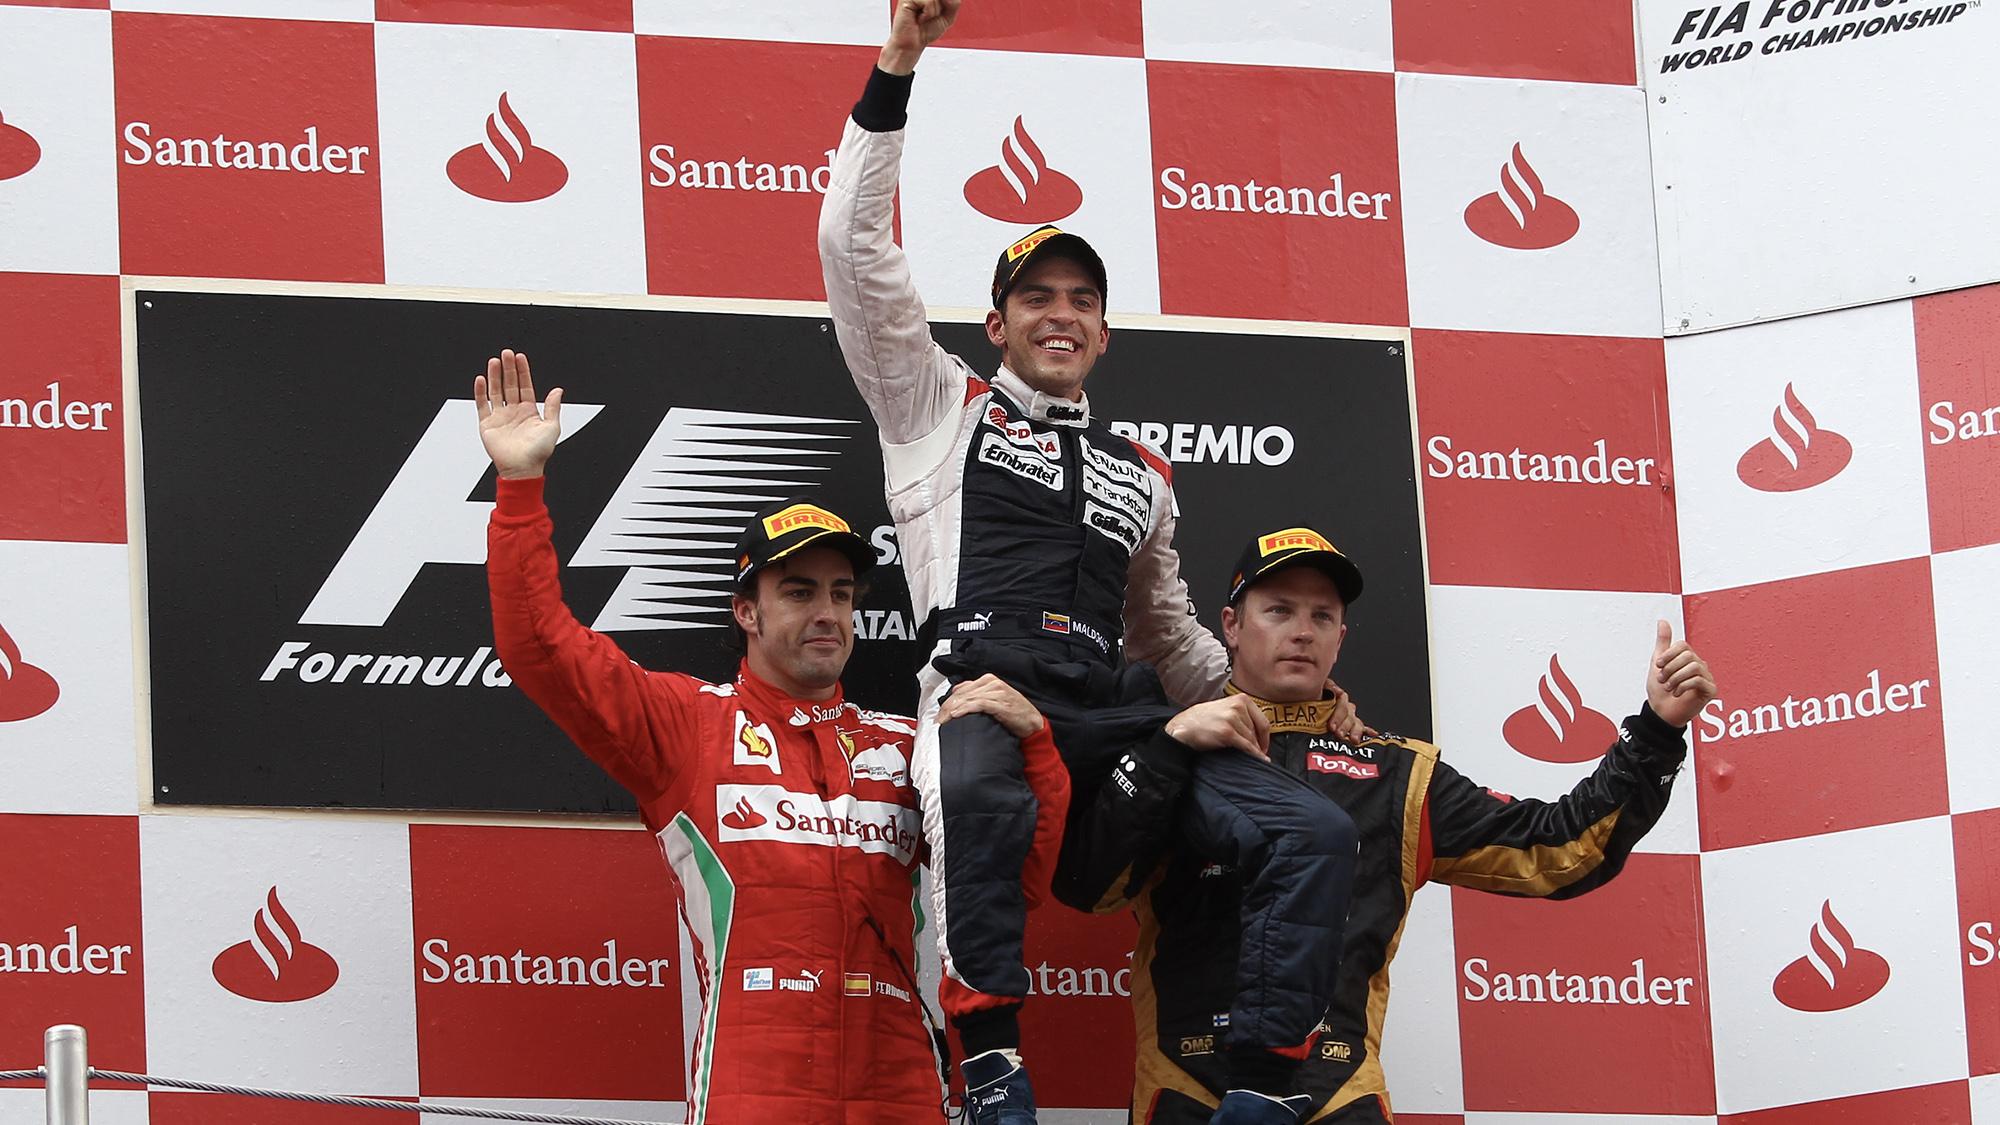 Pastor Maldonado celebrates victory in the 2012 F1 Spanish Grand Prix